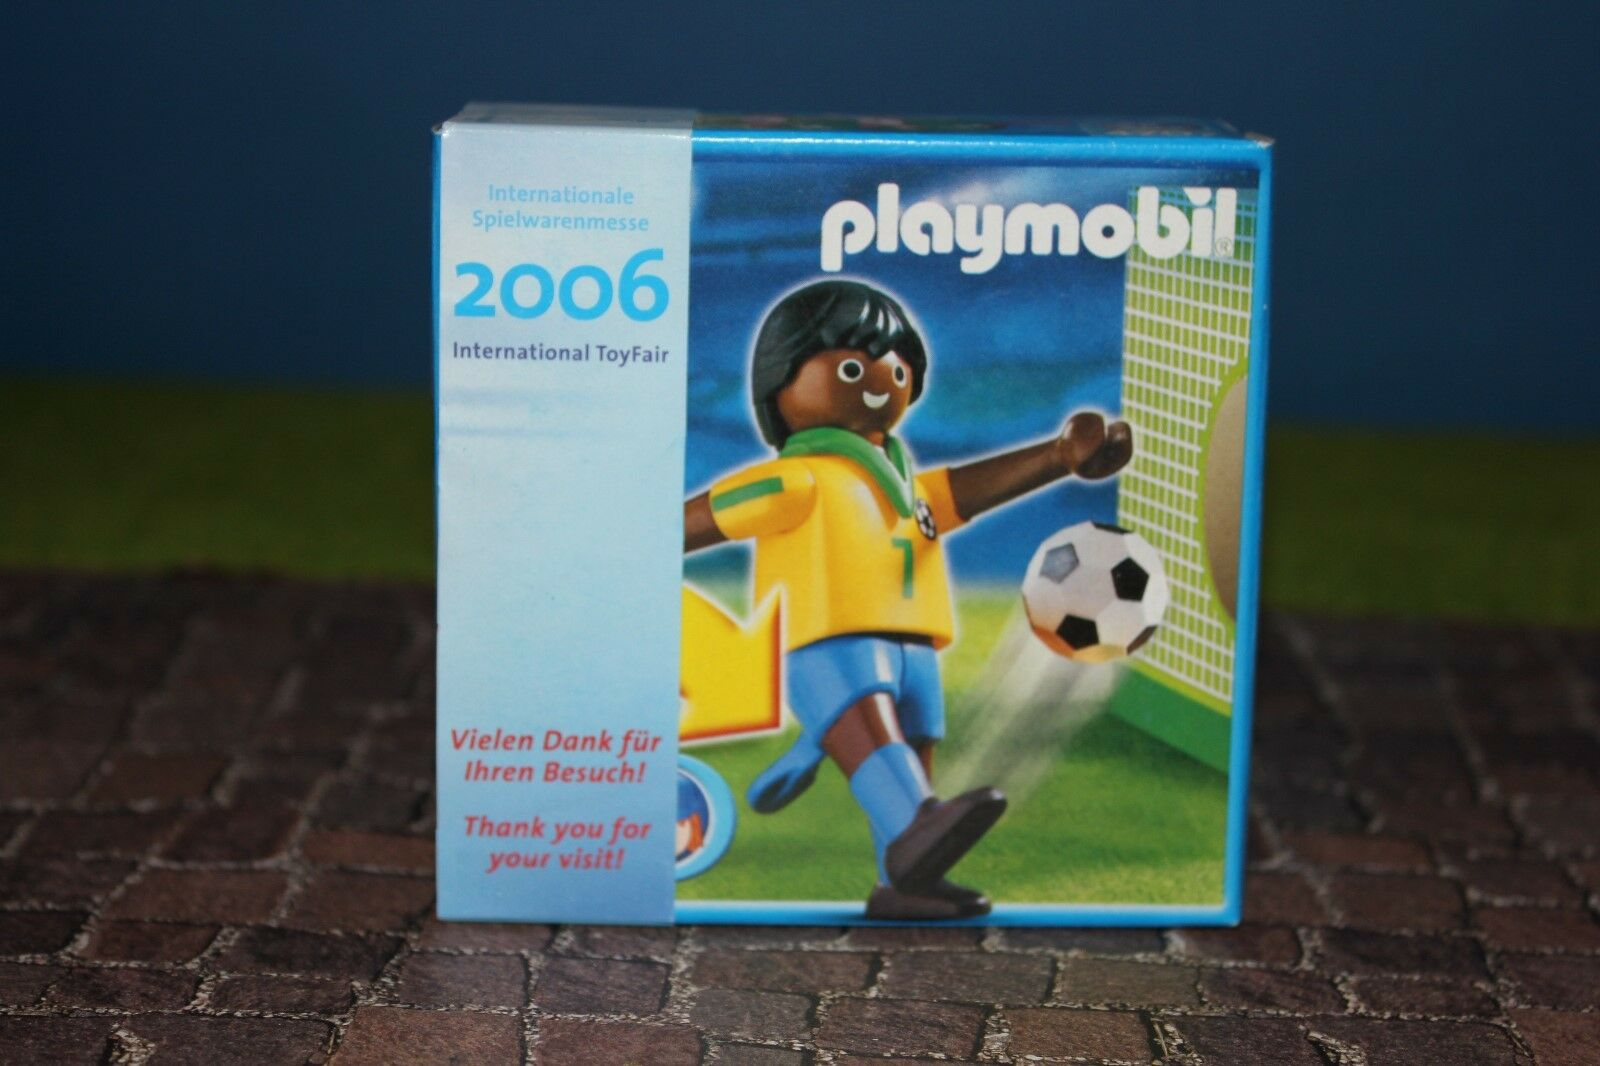 Playmobil Toy Trade Fair 2006 Brazil Promo Figurine Promotional Figure Nip